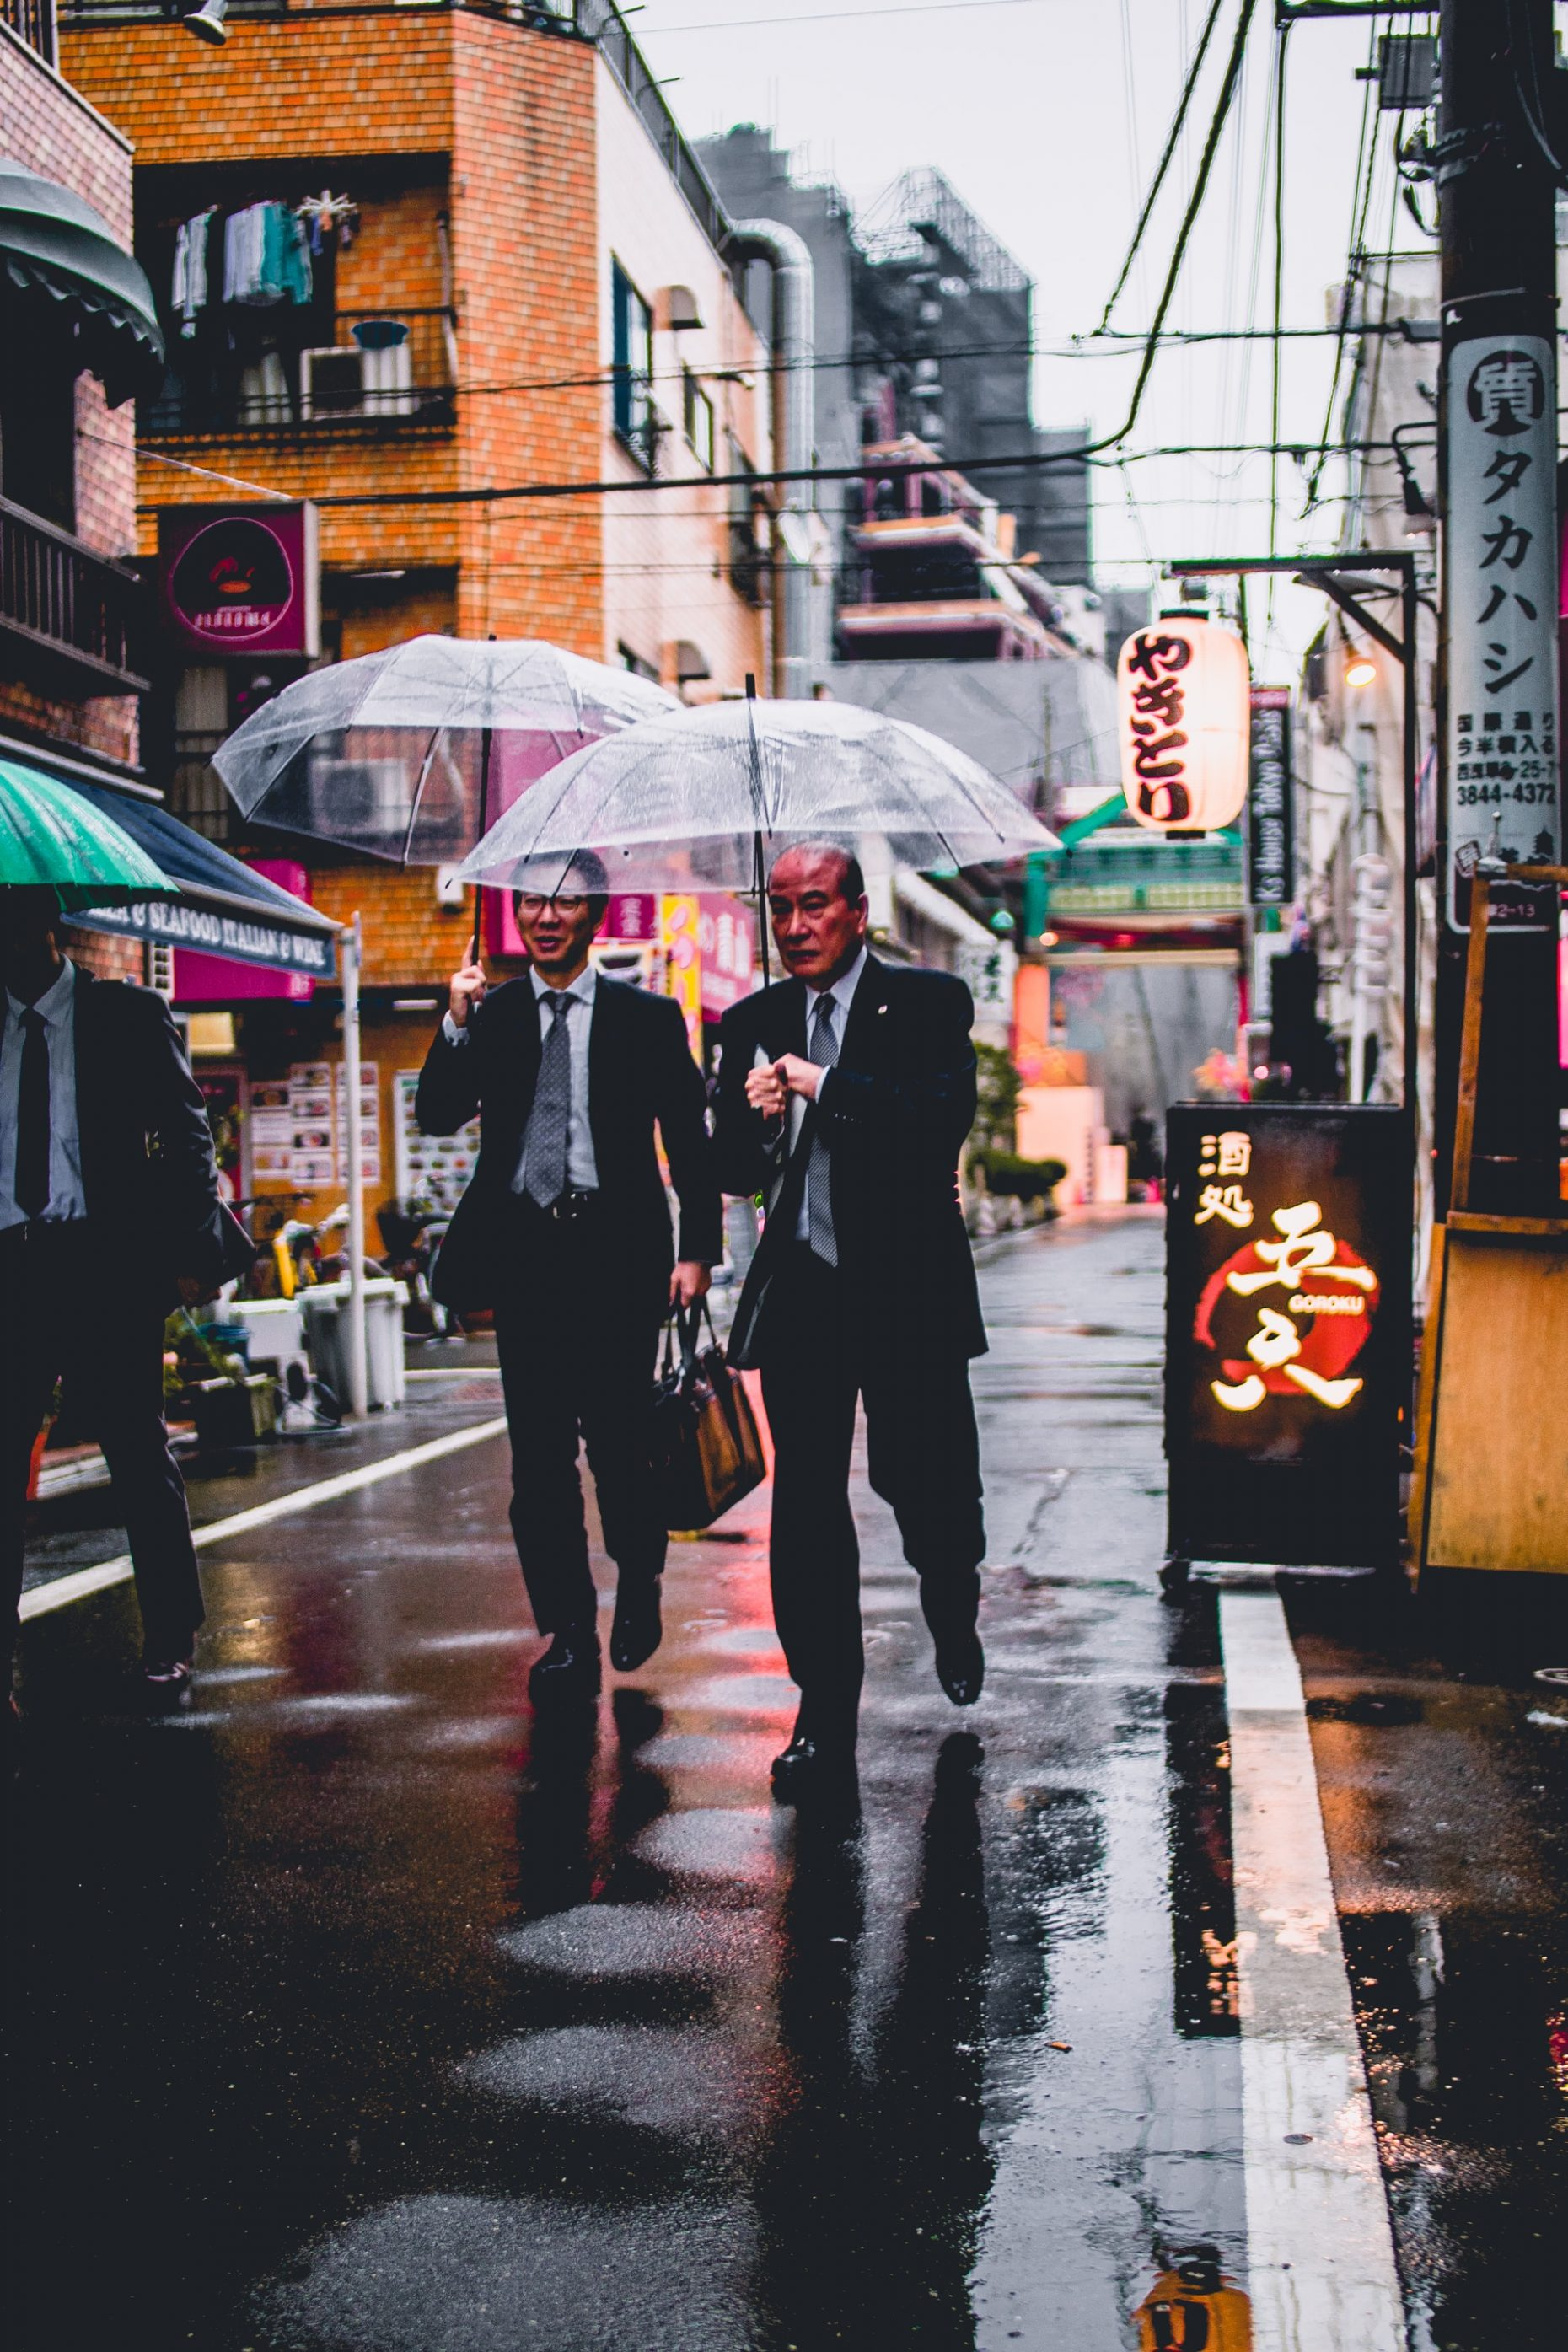 Businessmen walking meeting